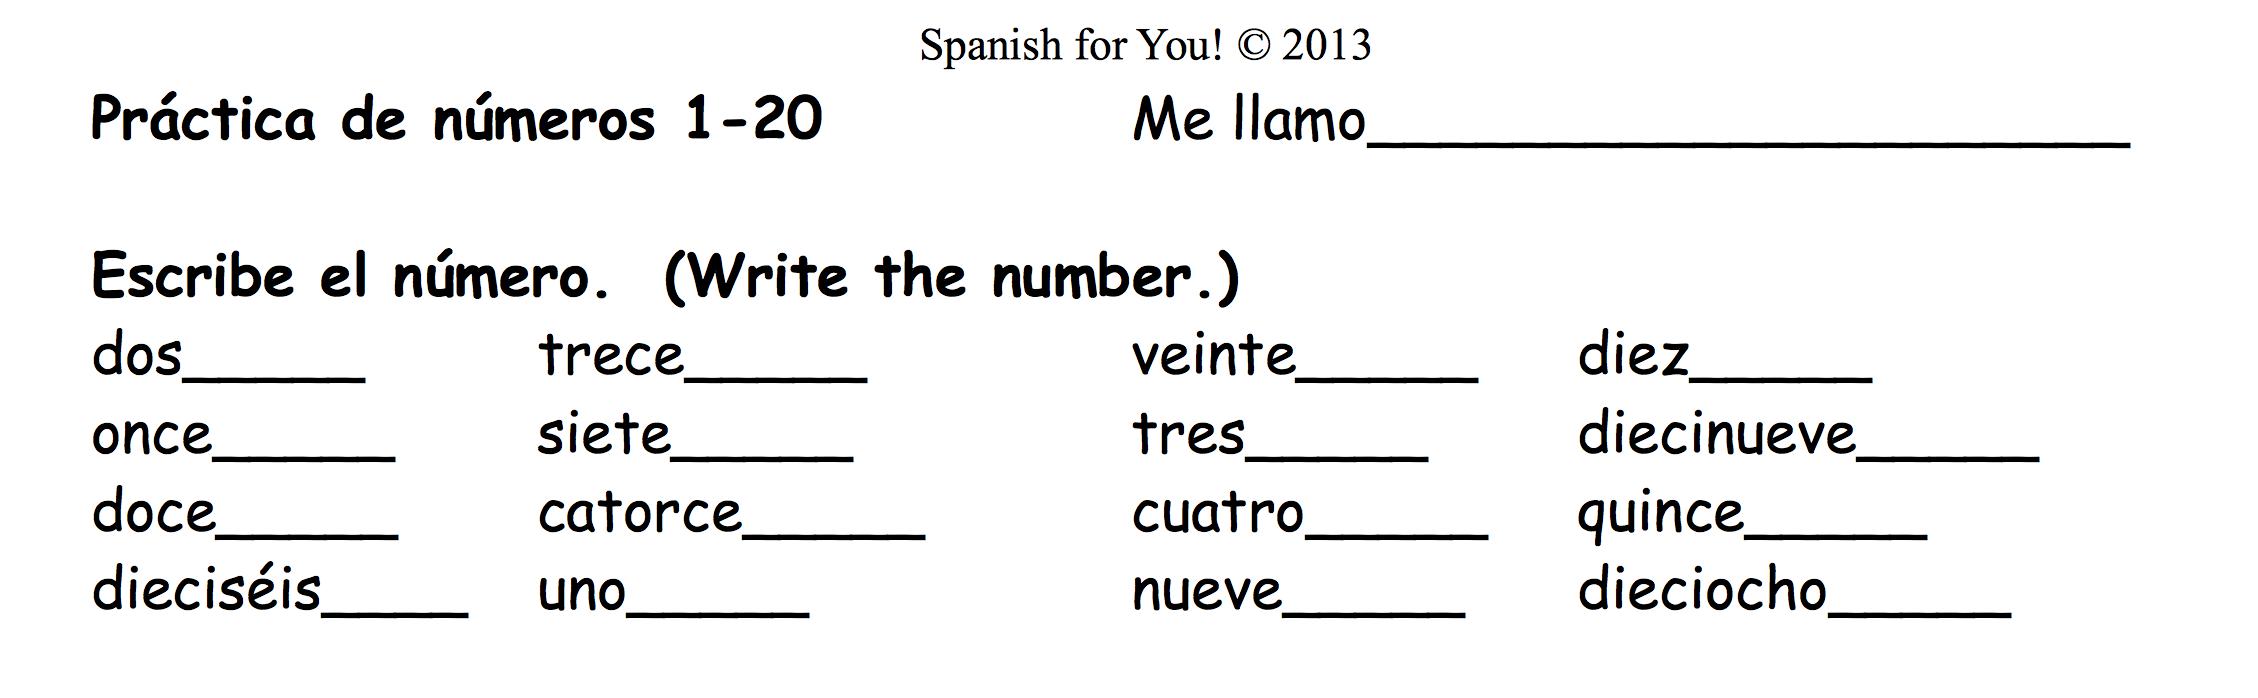 Workbooks number practice worksheets : Spanish Numbers Practice Worksheet Free Worksheets Library ...